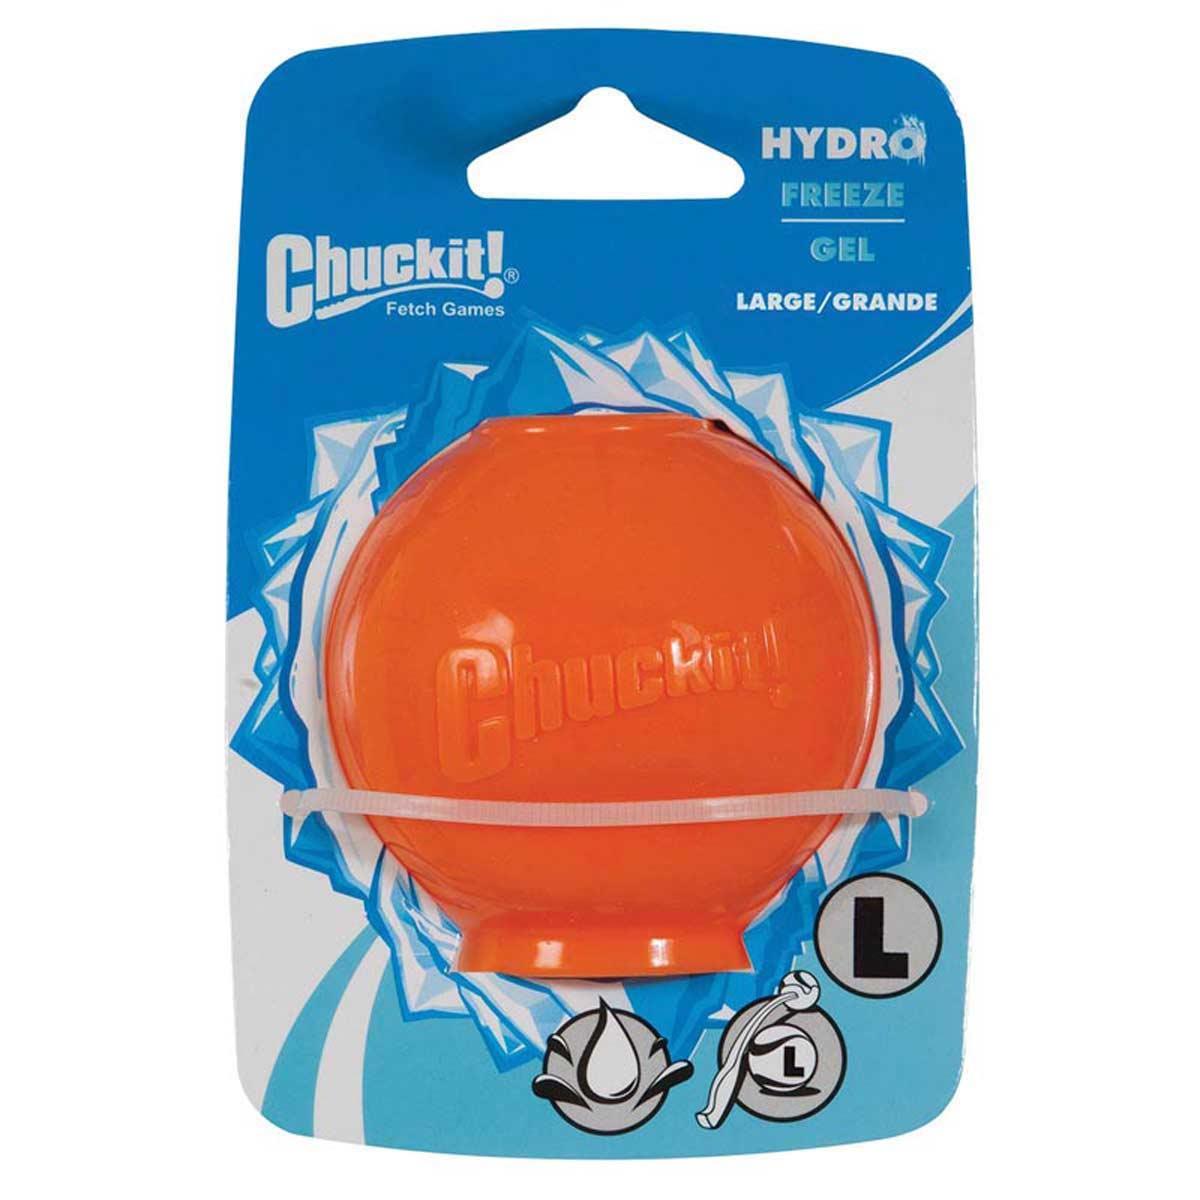 Chuckit! Hydrofreeze Ball Large Size - For Fetch